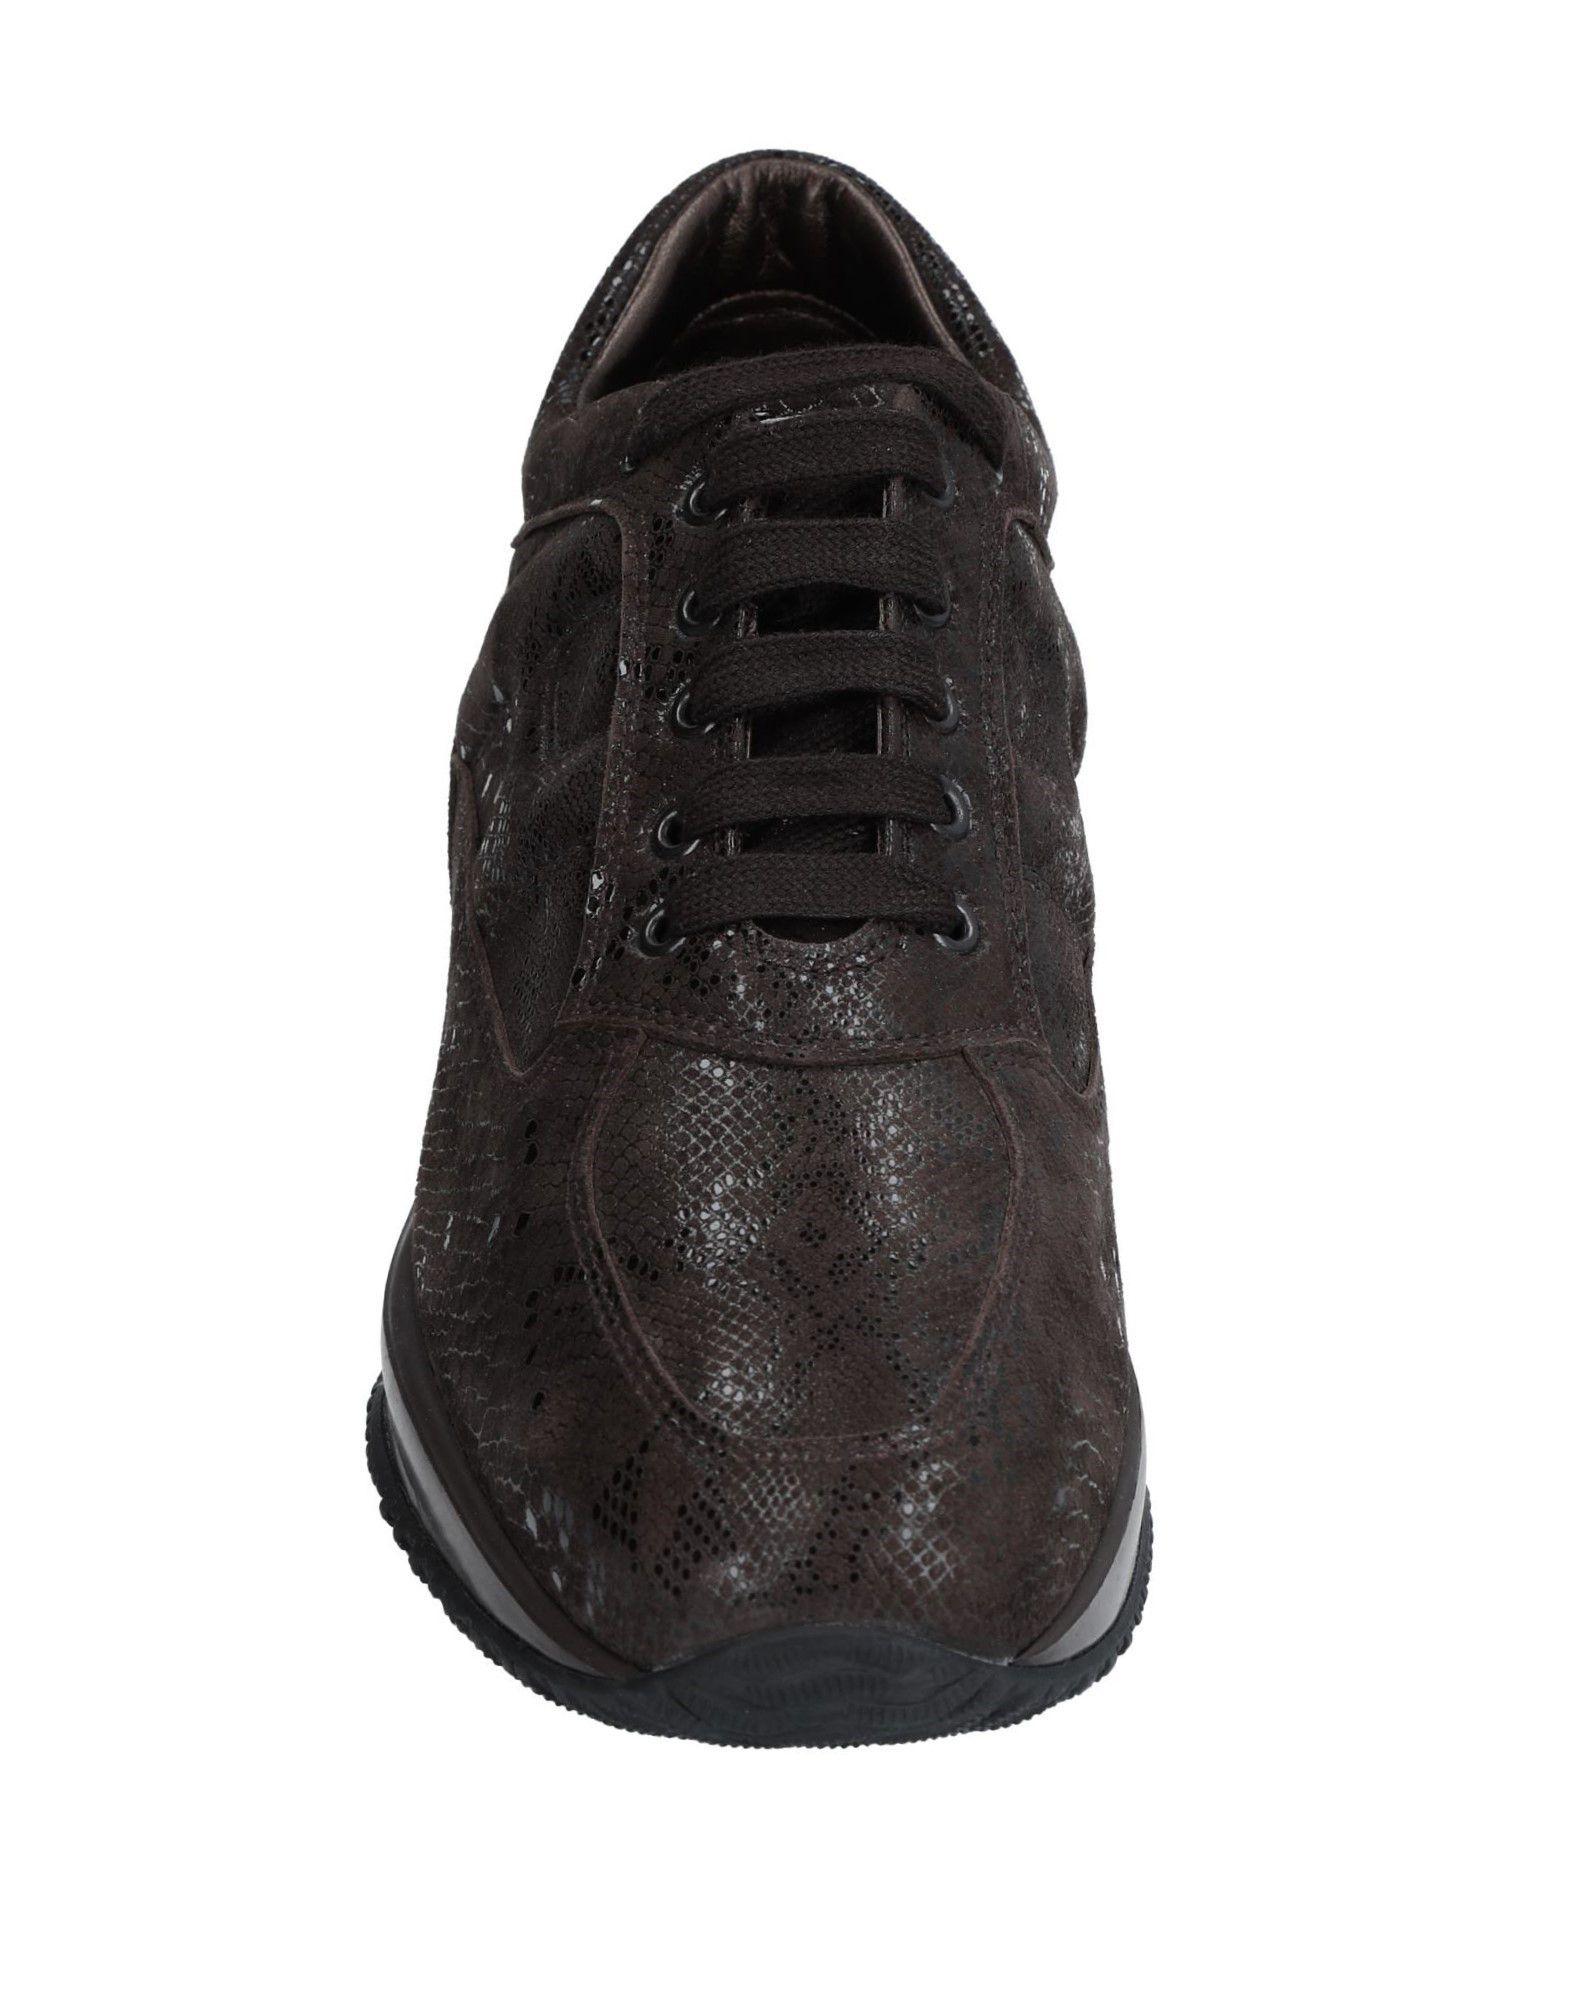 Hogan aussehende Sneakers Damen  11537941KVGut aussehende Hogan strapazierfähige Schuhe f9edde